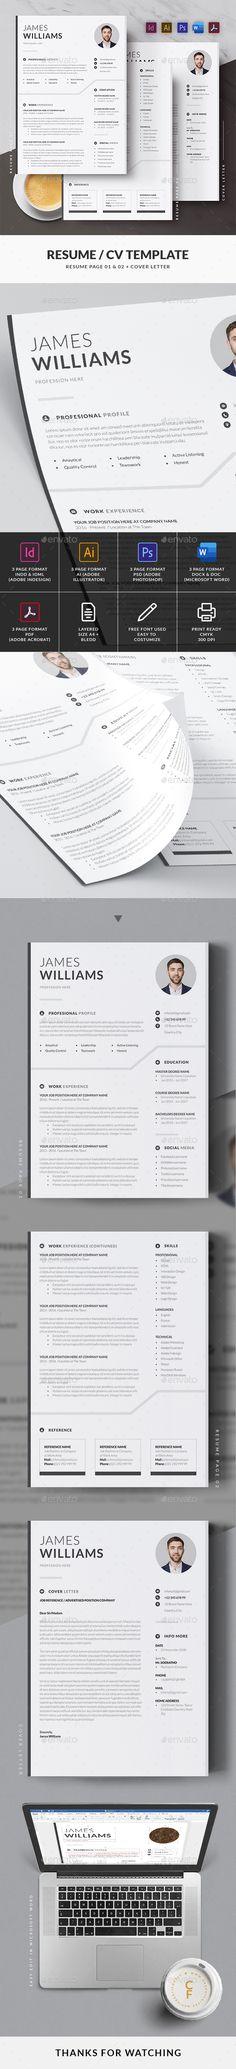 Simple Resume / CV Template Cv Design, Free Design, Cv Template, Templates, Simple Resume, Change Image, Resume Cv, Very Well, Photoshop